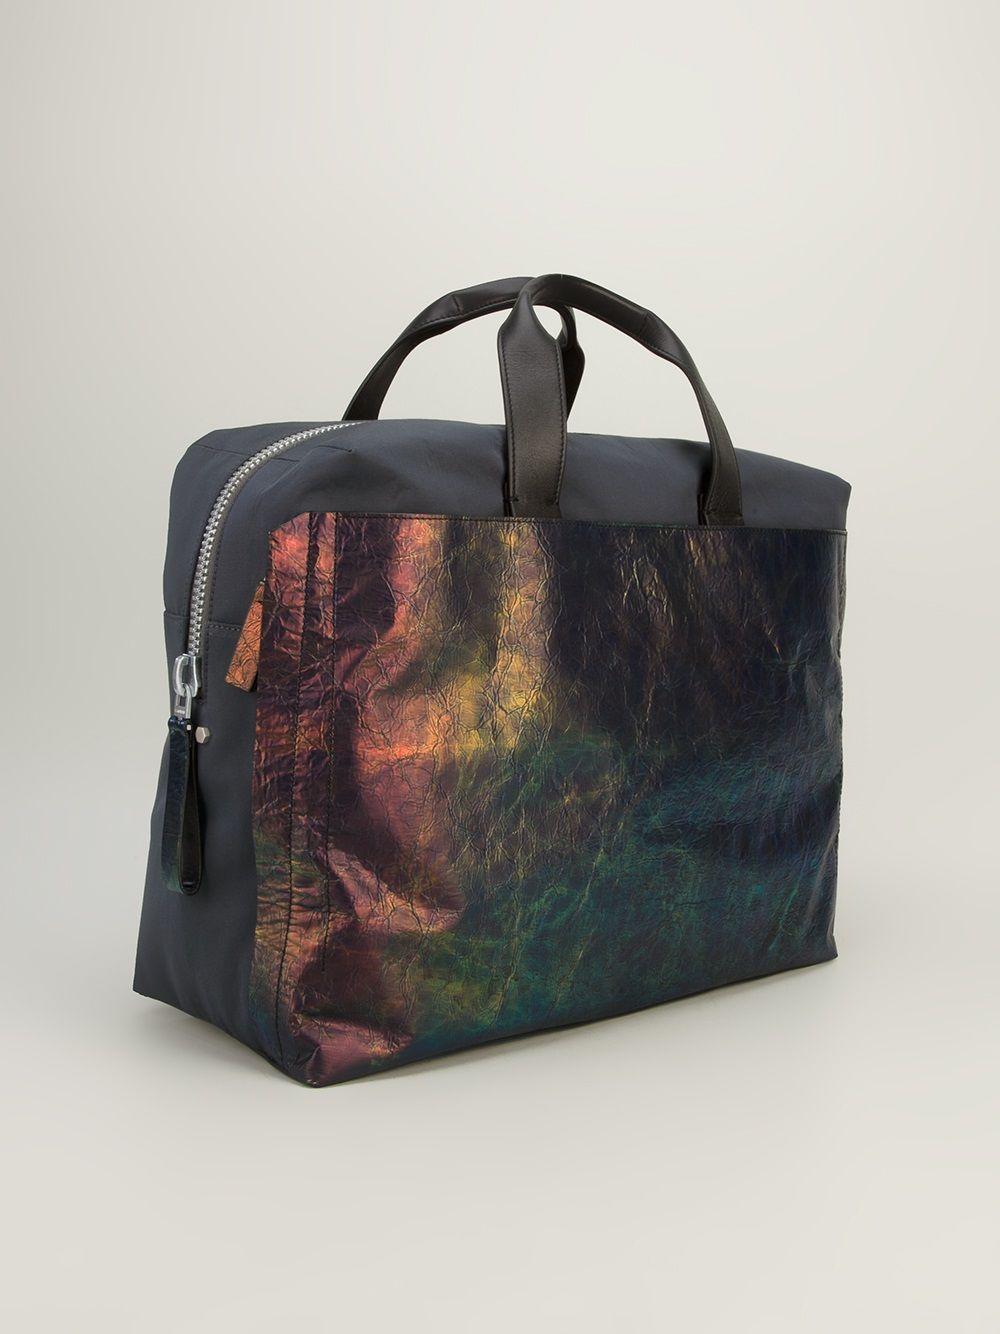 Statement Bag - Squeeze by VIDA VIDA KShUk0